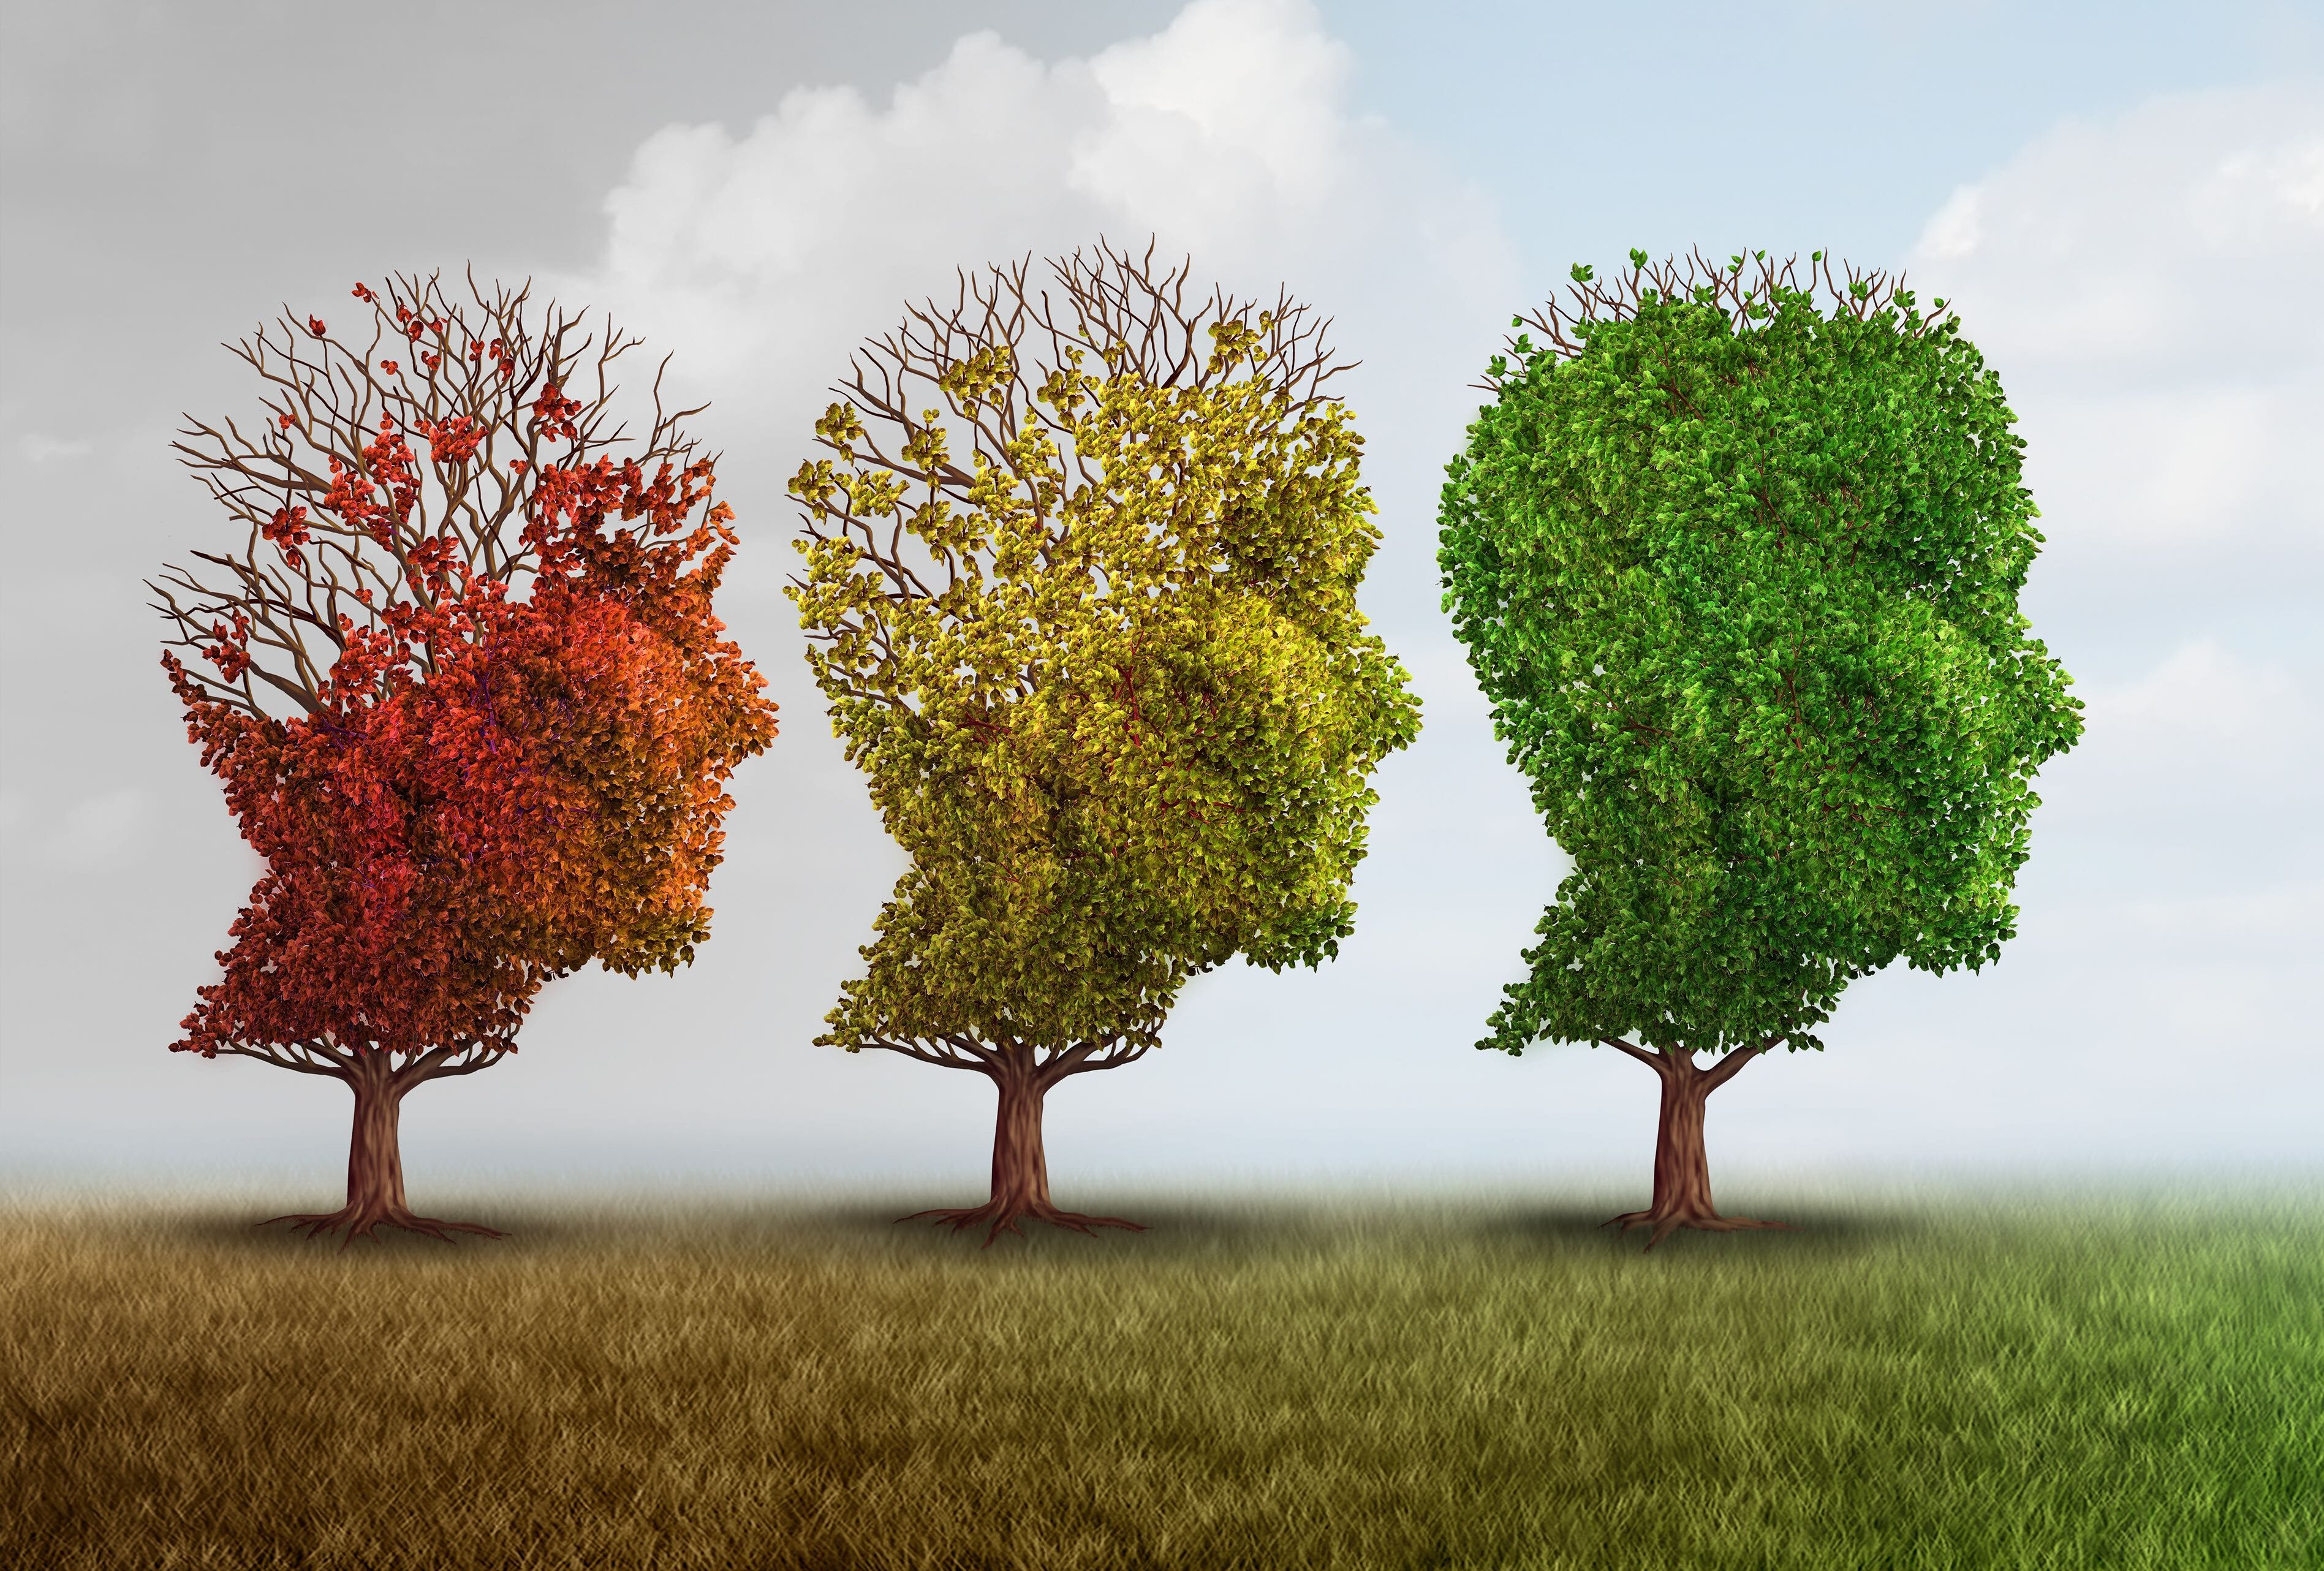 Can Dementia Be Reversed?